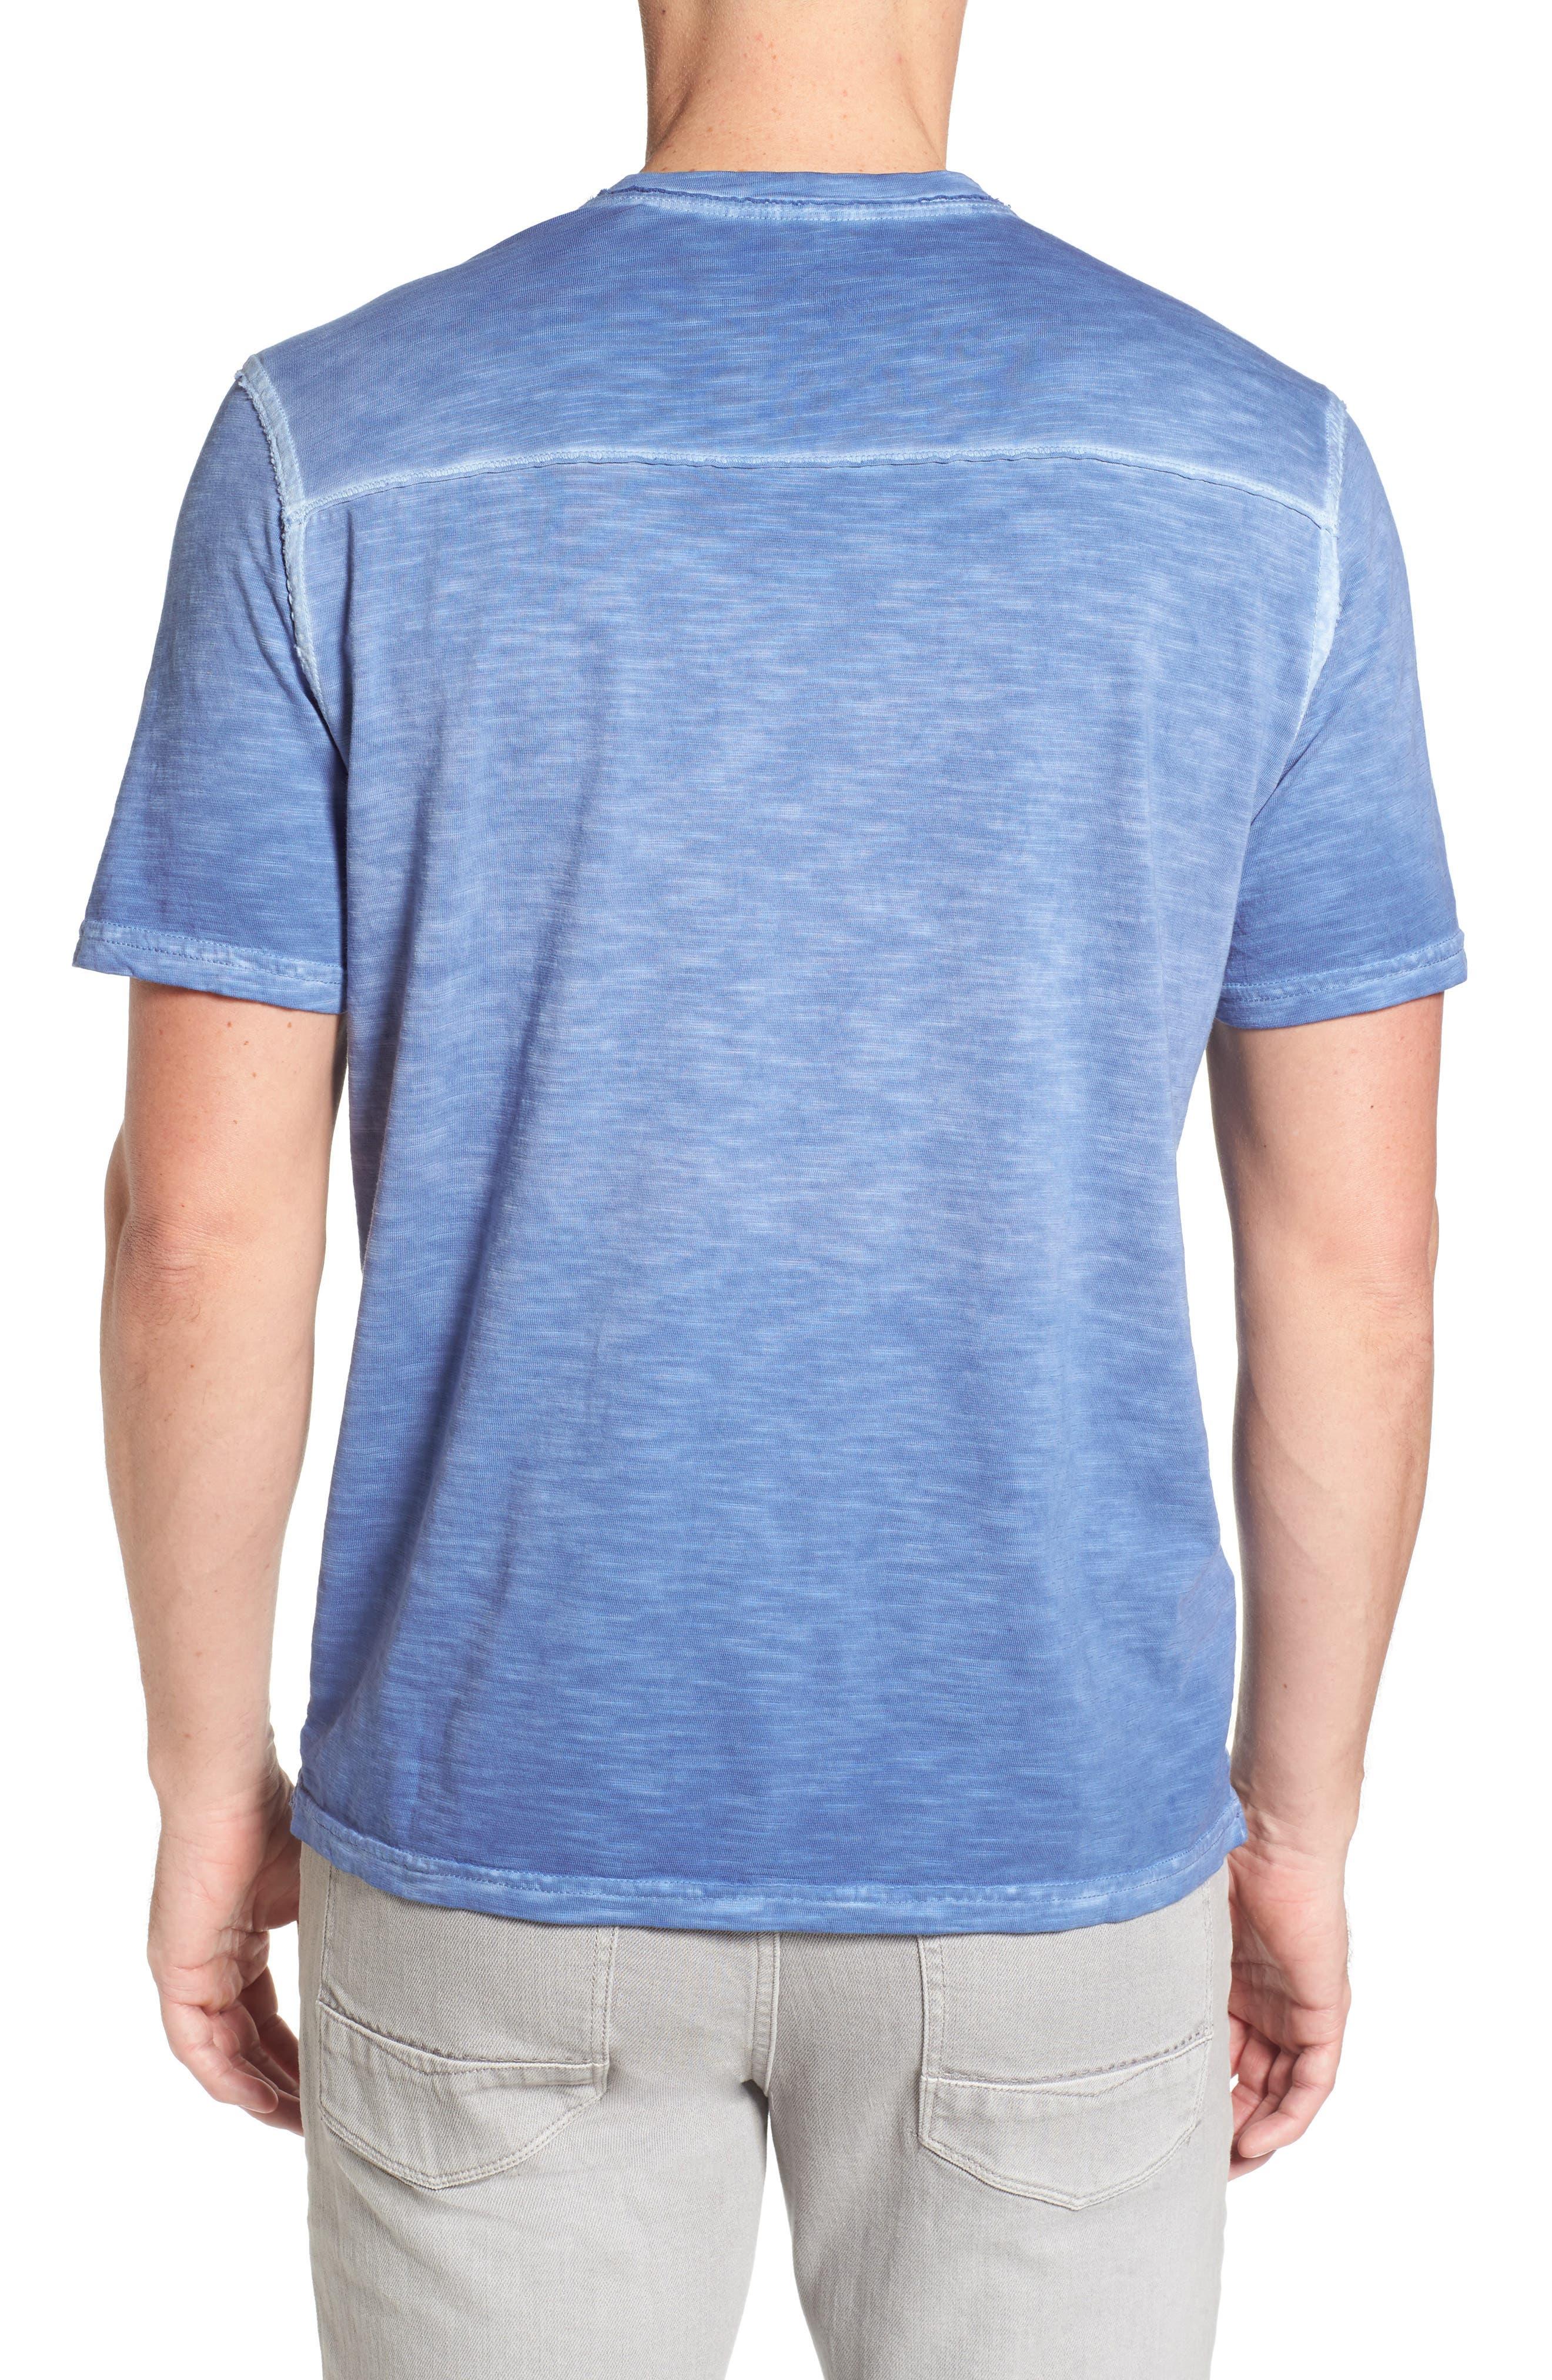 Suncoast Shores V-Neck T-Shirt,                             Alternate thumbnail 2, color,                             Dockside Blue